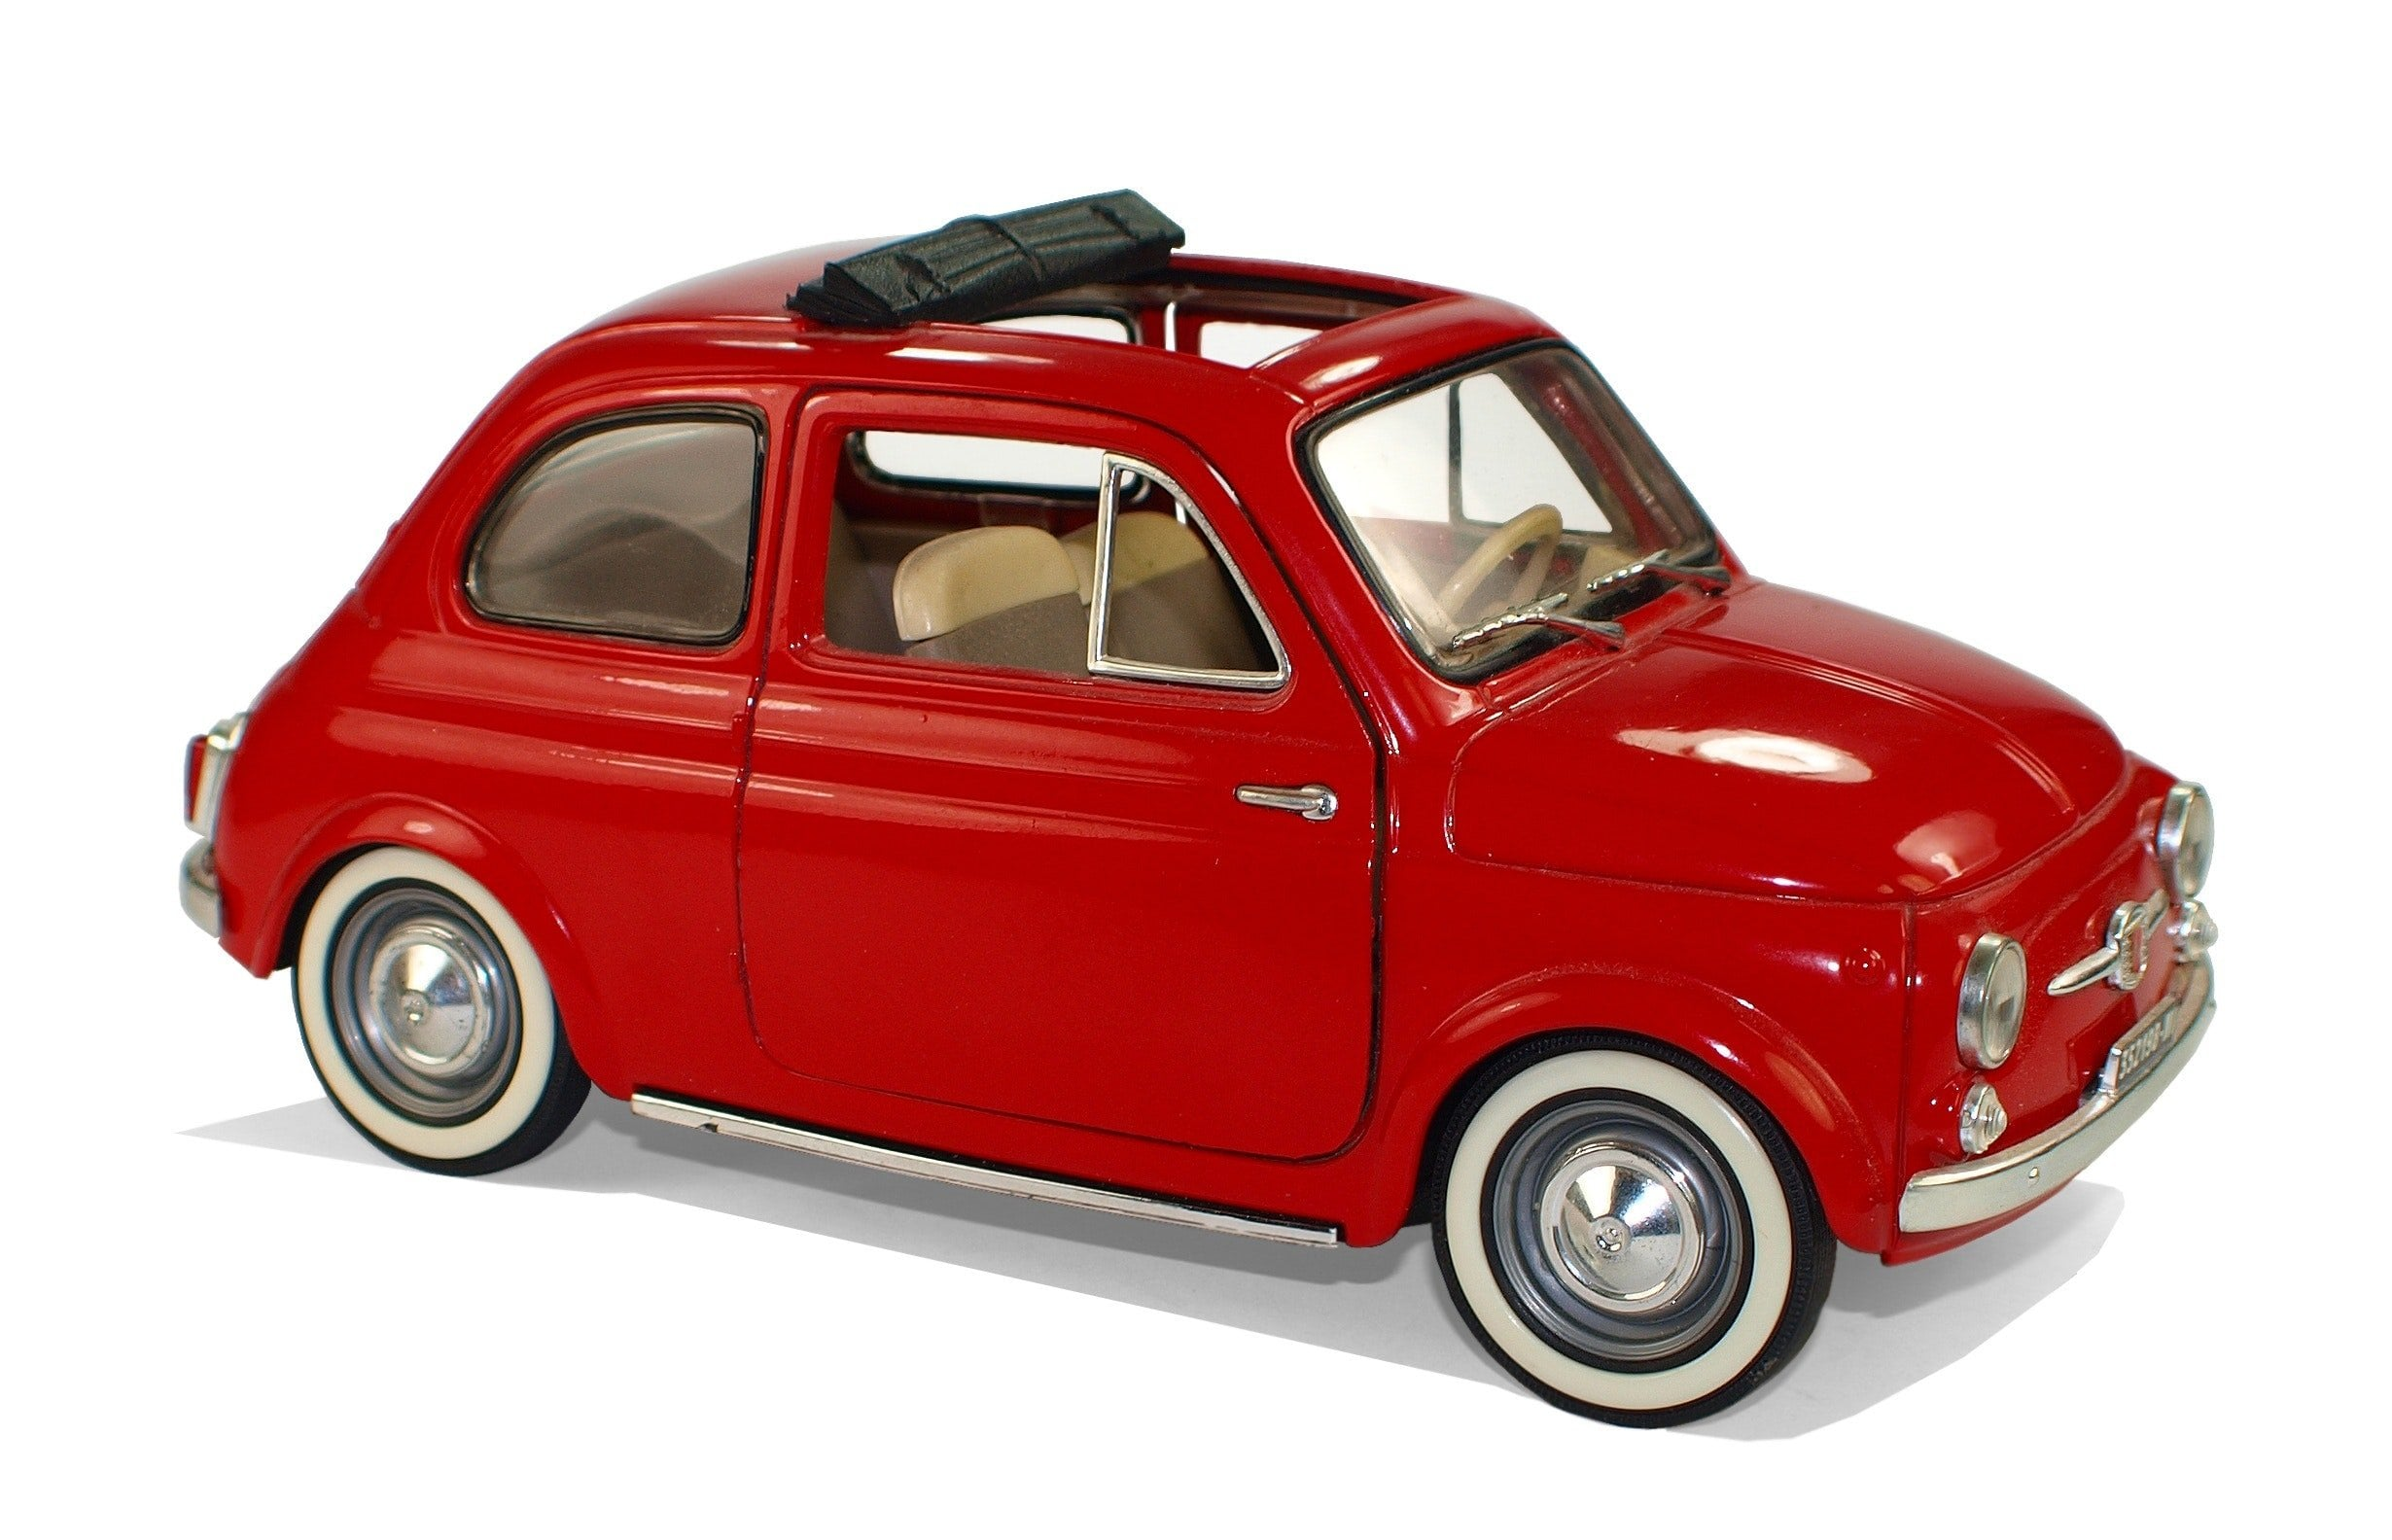 500 pound loans fiat 500 red car